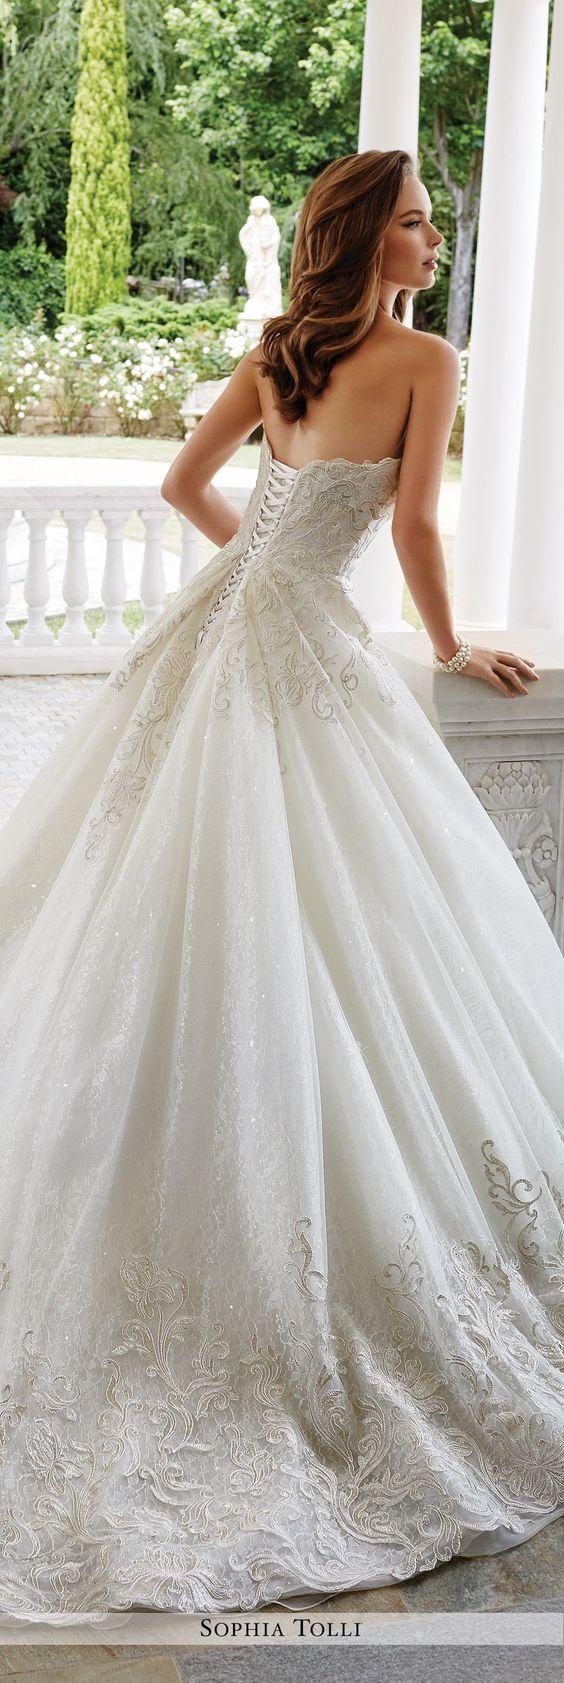 Baljurk bruiloft bruidsjurken and togahuwelijk on pinterest for Sophia tulle wedding dress